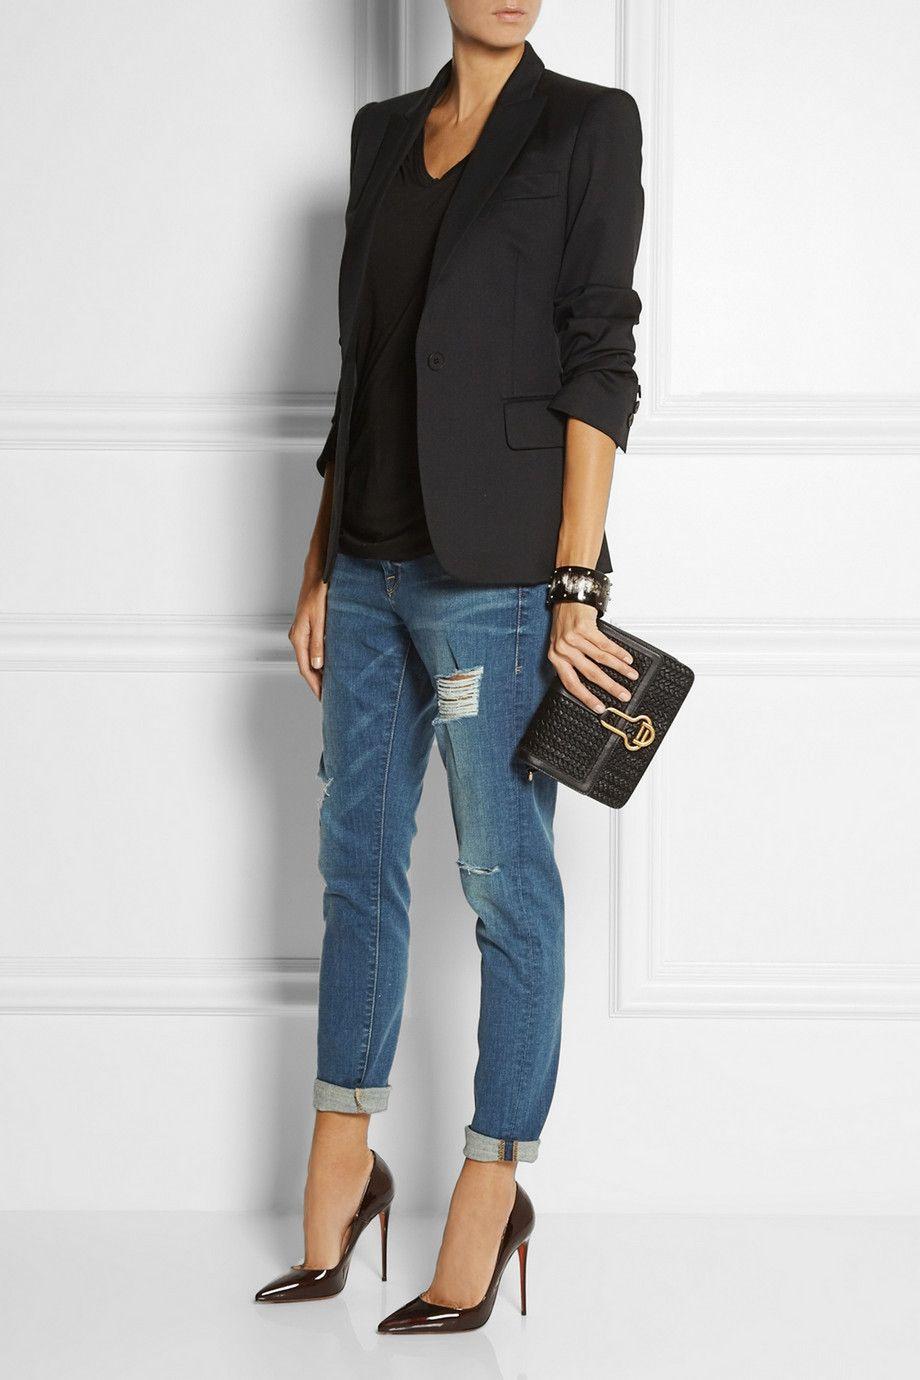 Christian Louboutin shoes, Stella McCartney jacket, T by Alexander Wang top, Ashley Pittman bracelet, Frame Denim jeans, Maiyet bag.